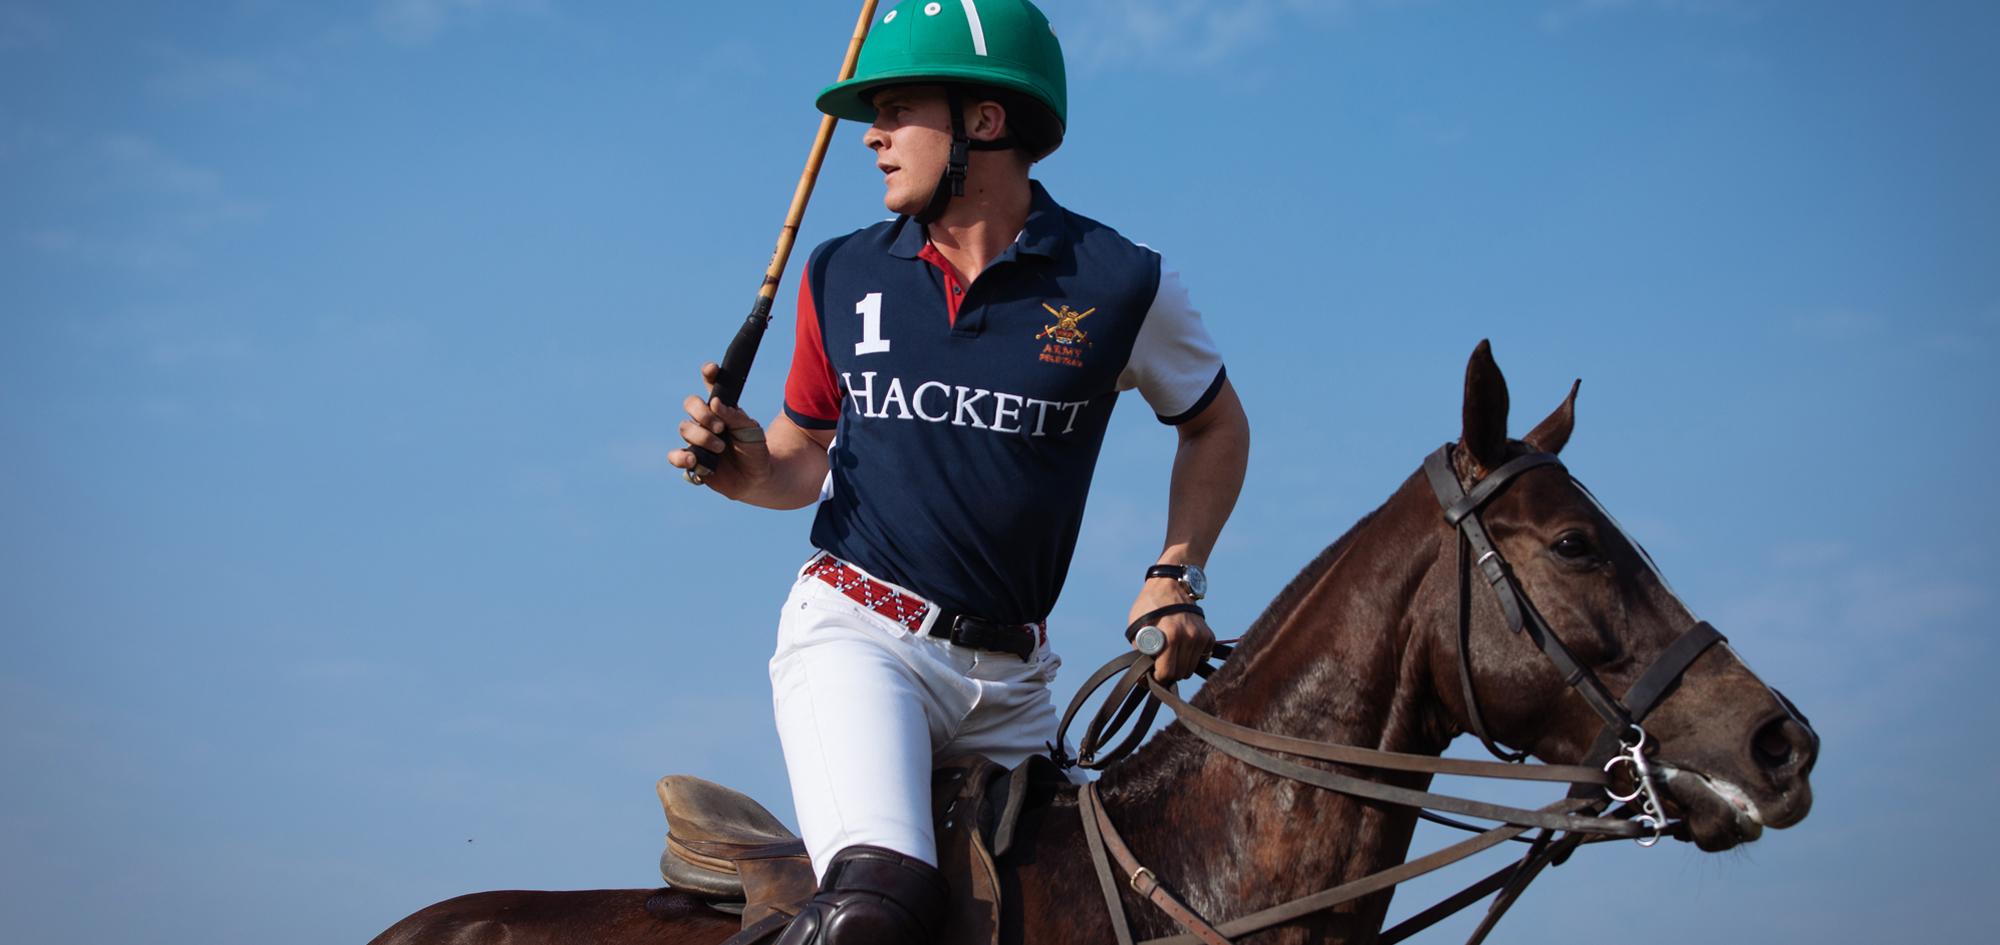 Hackett-London-British-Army-Polo-FS-2019-Poloshirts-Menswear-Polohemden-Fashion